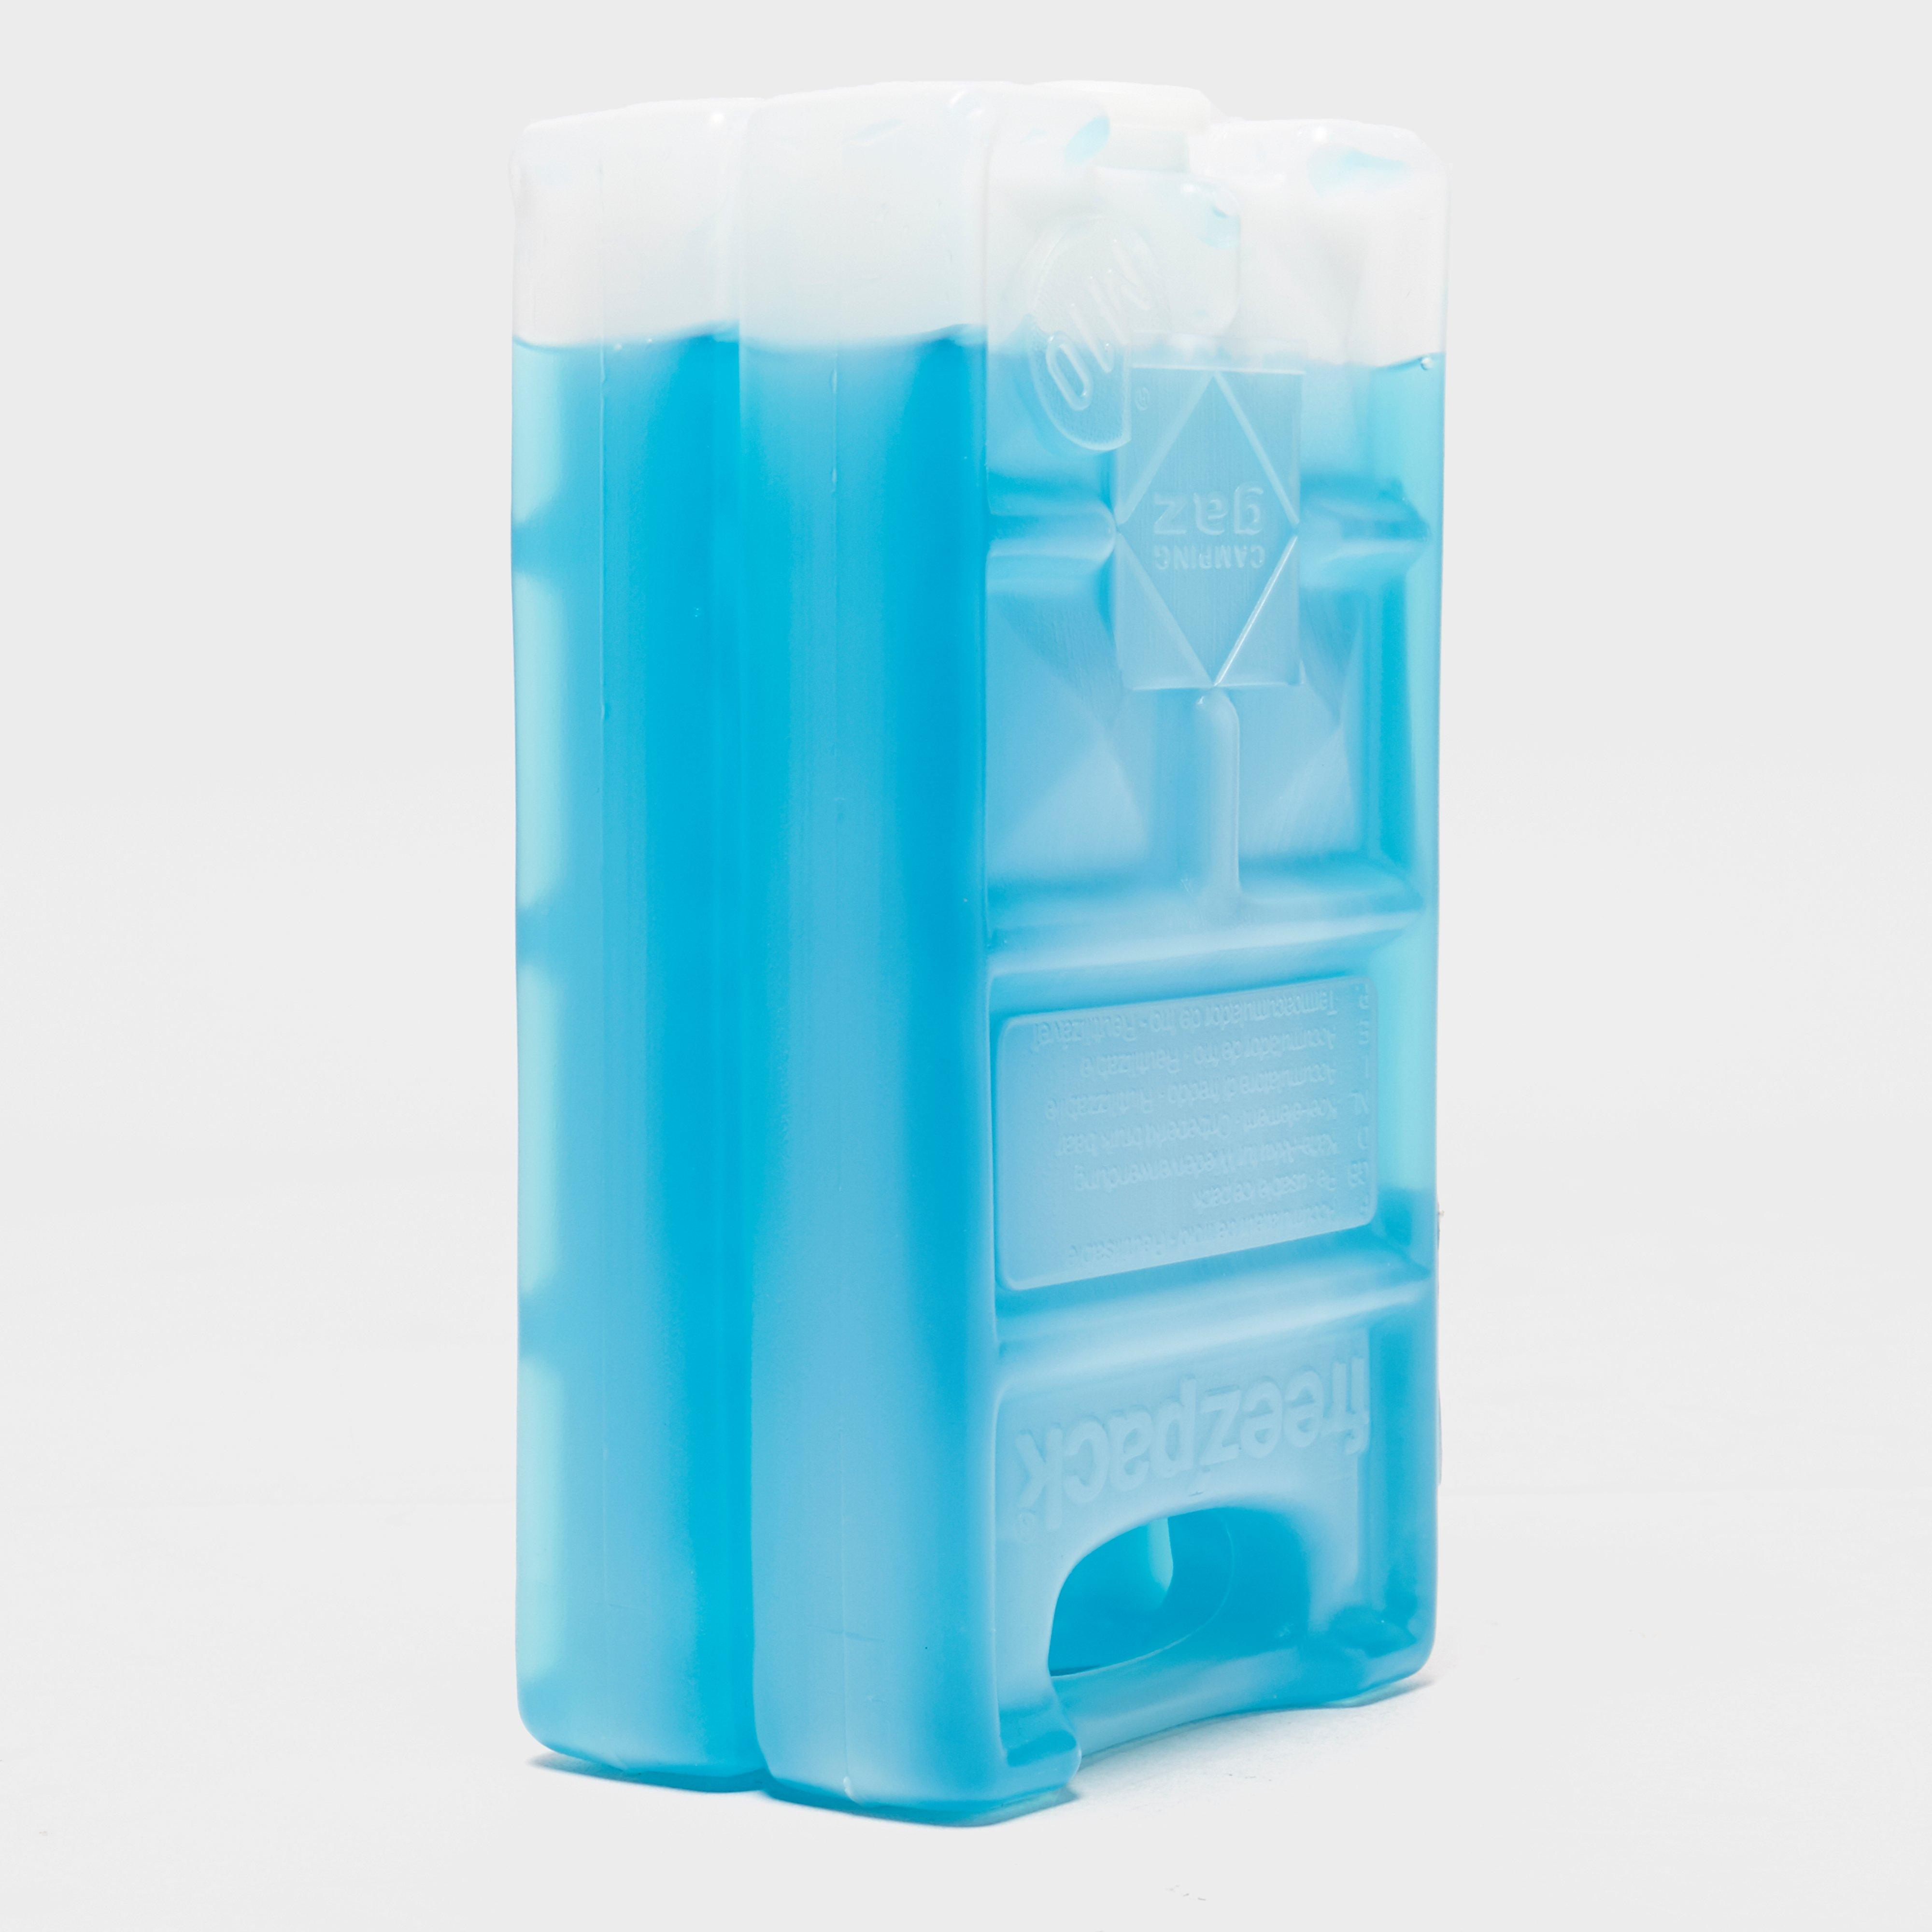 Coleman Coleman Ice Pack 800g - Blue, Blue